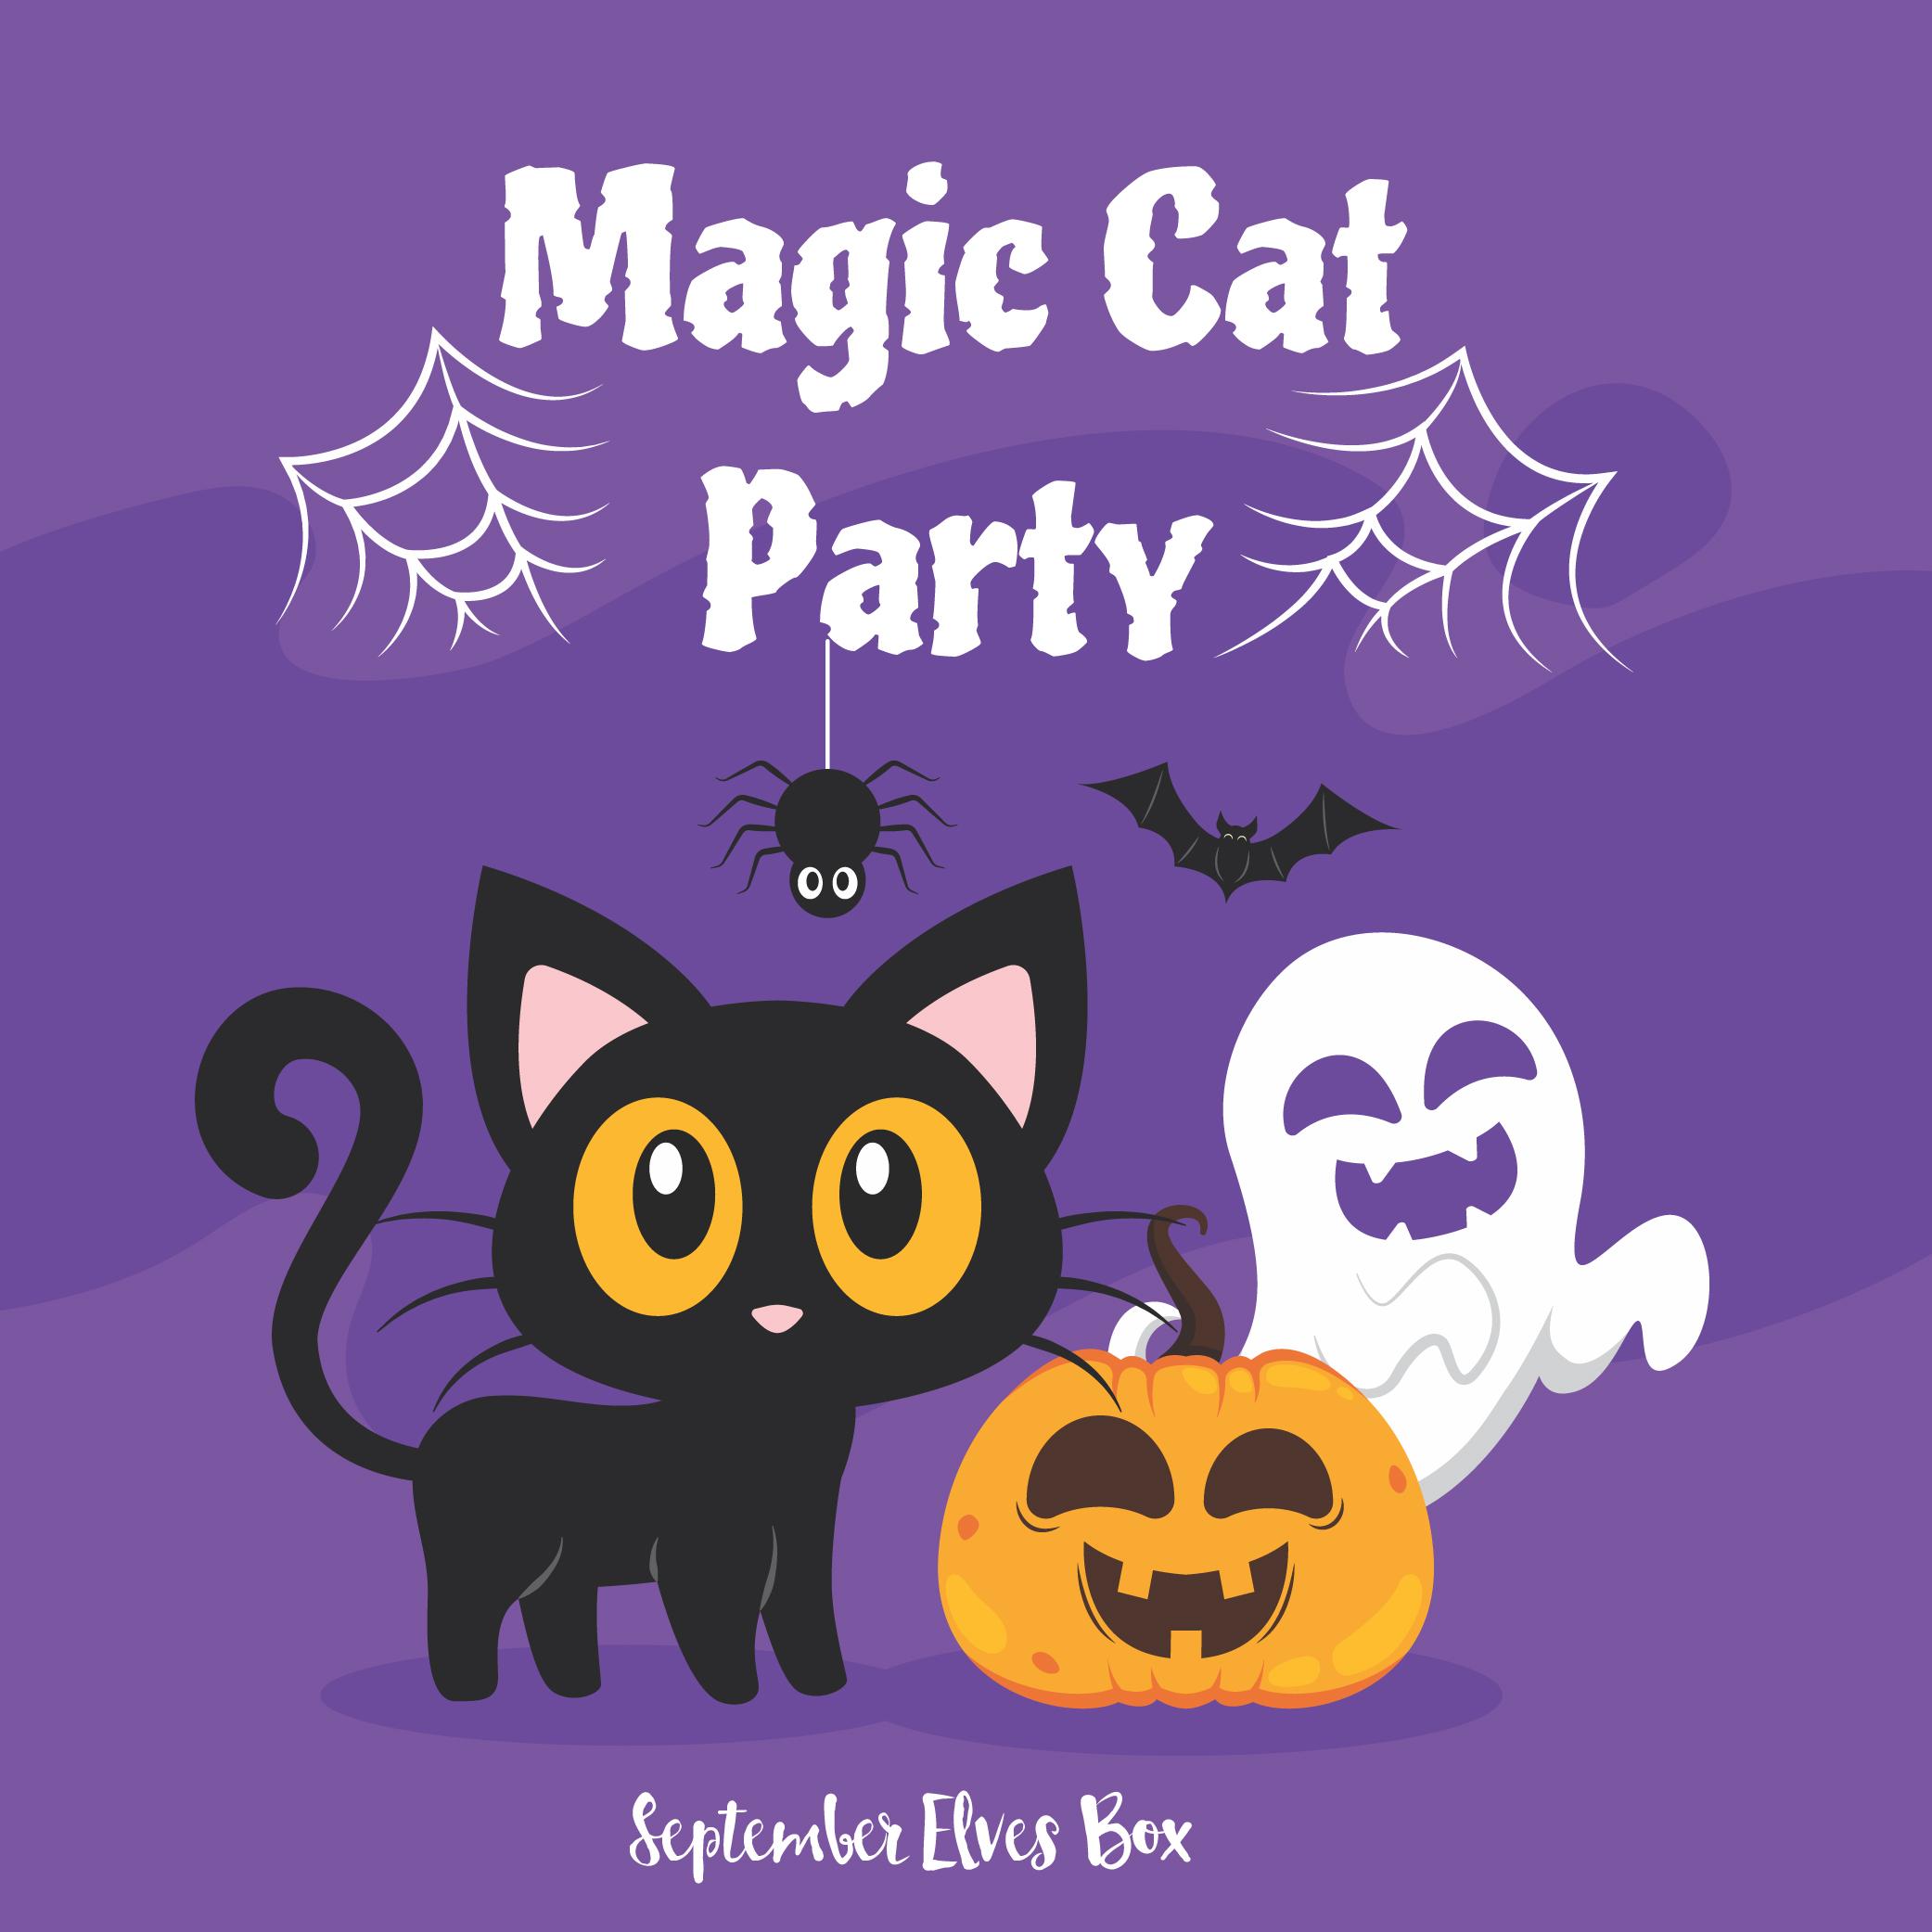 sept-magic-cat-party.jpg